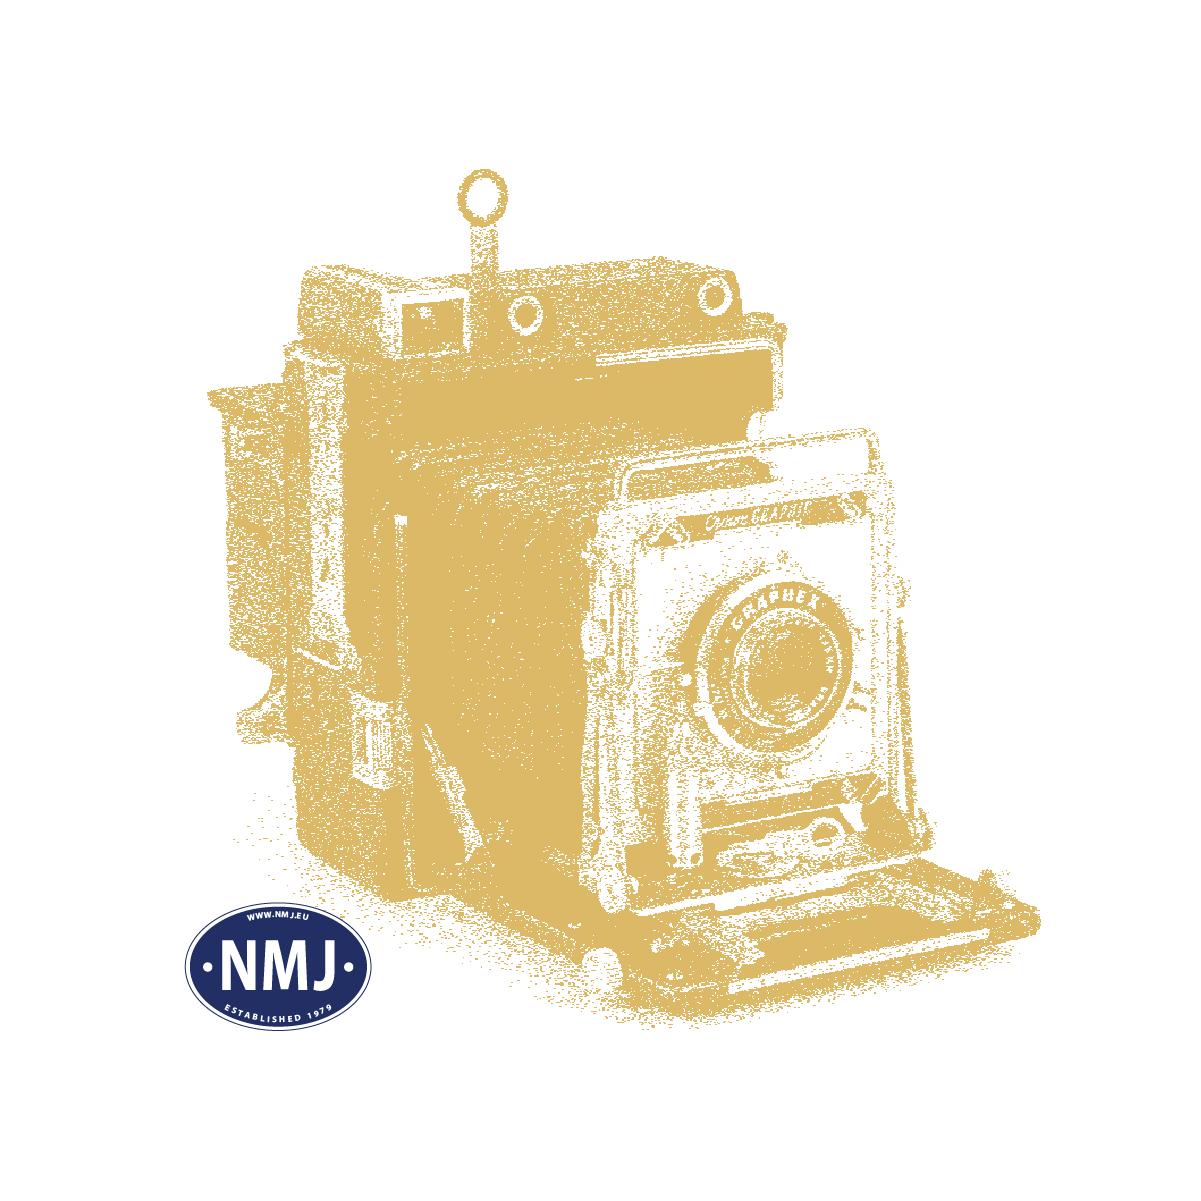 NMJT203.002 - NMJ Topline SJ AB3K 4864, 1/2 Cl. Passenger coach, old SJ logo